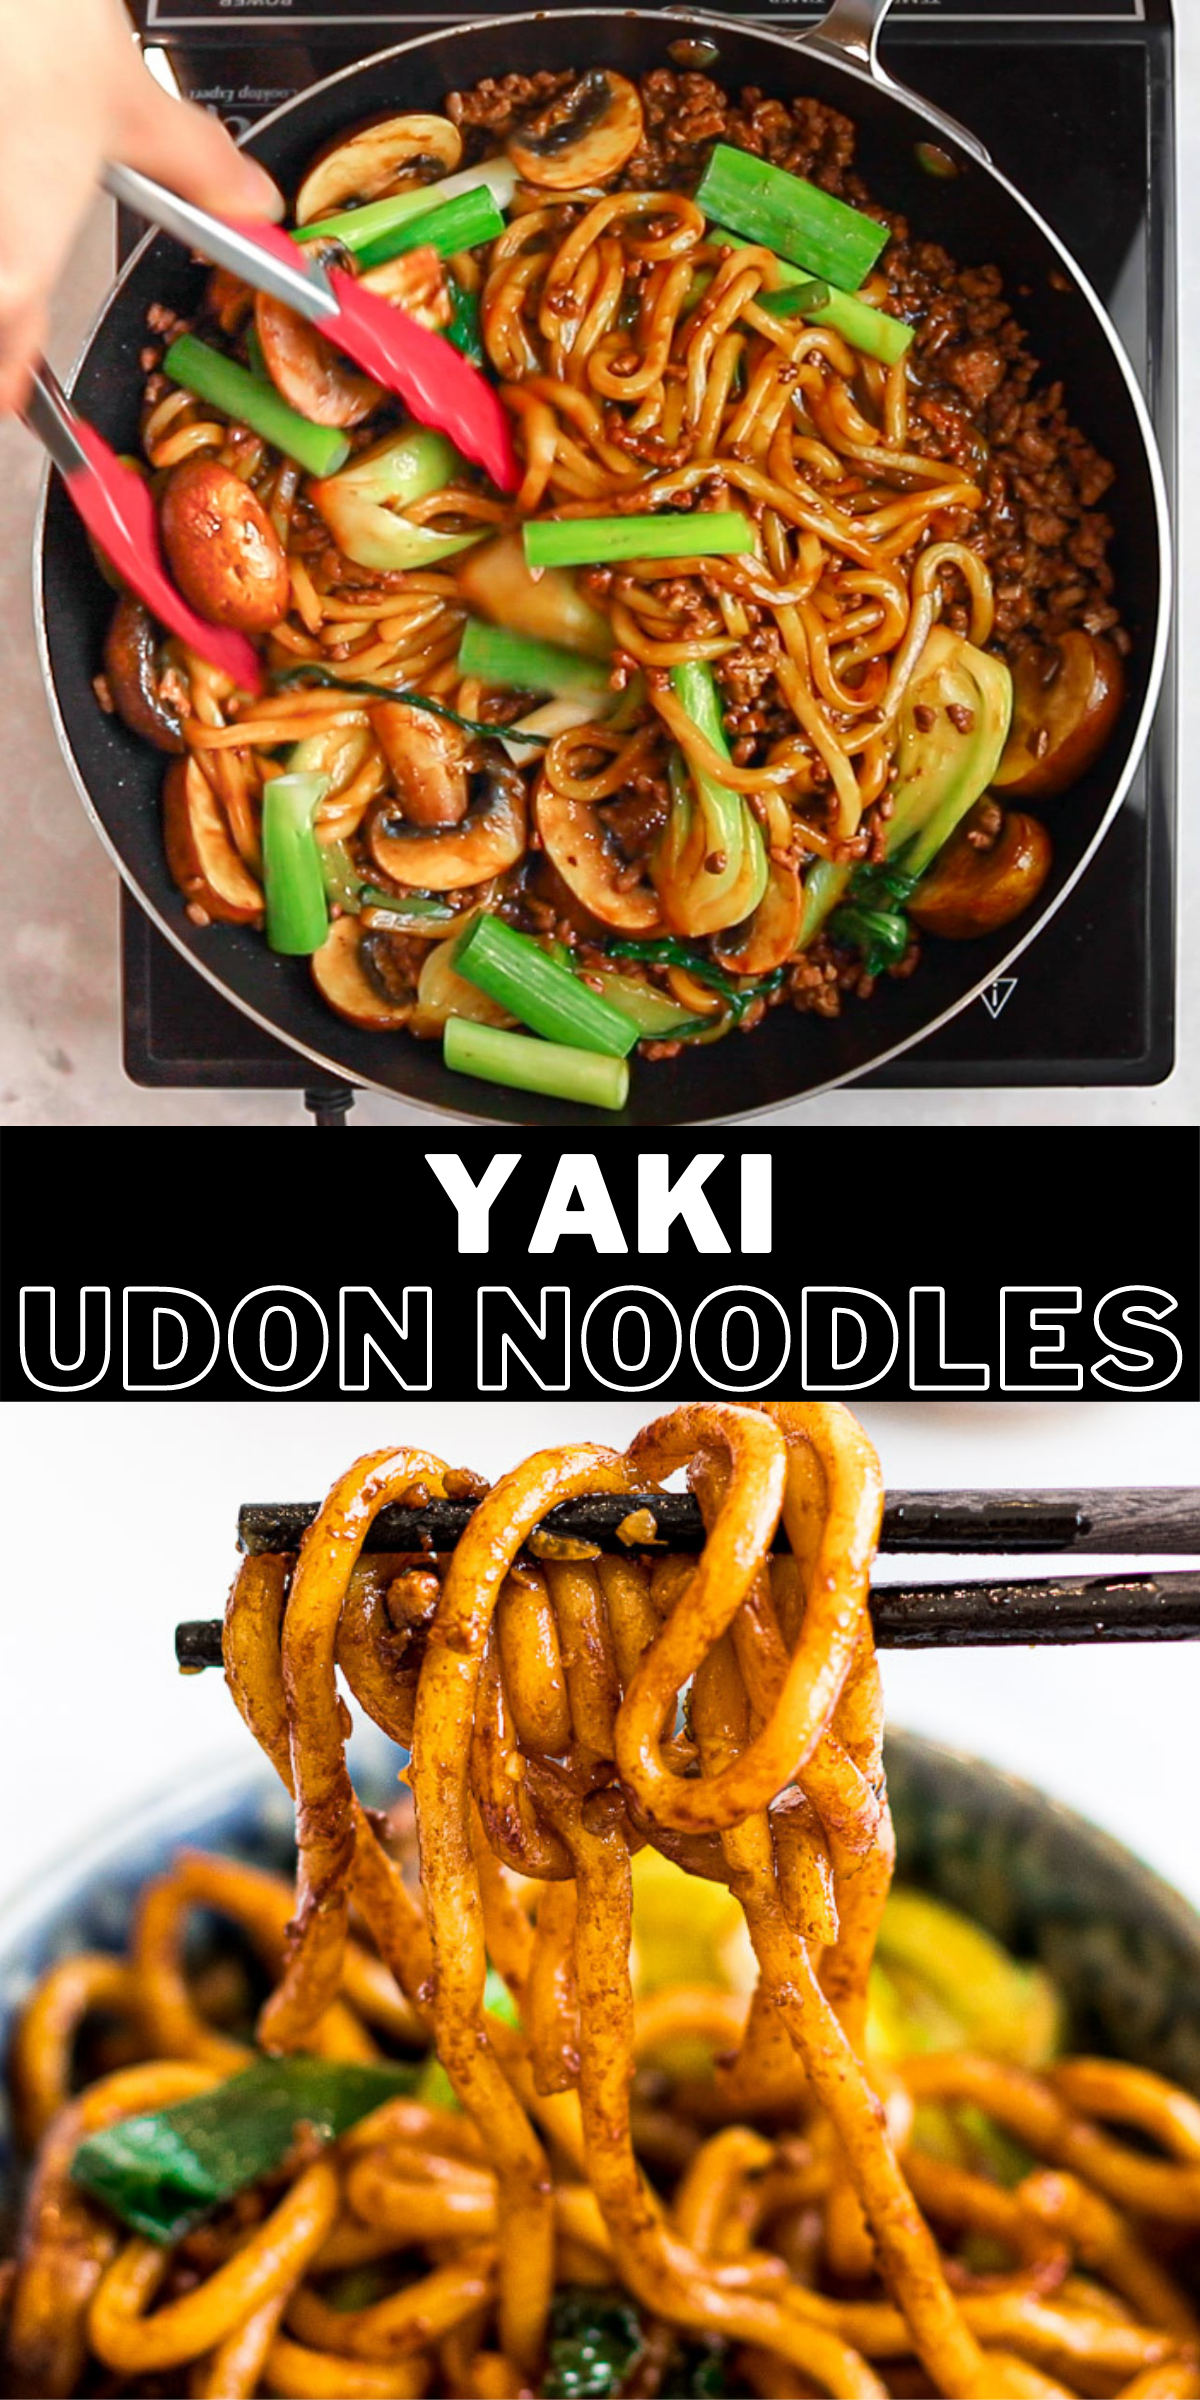 Stir Fried Udon Noodles | Yaki Udon